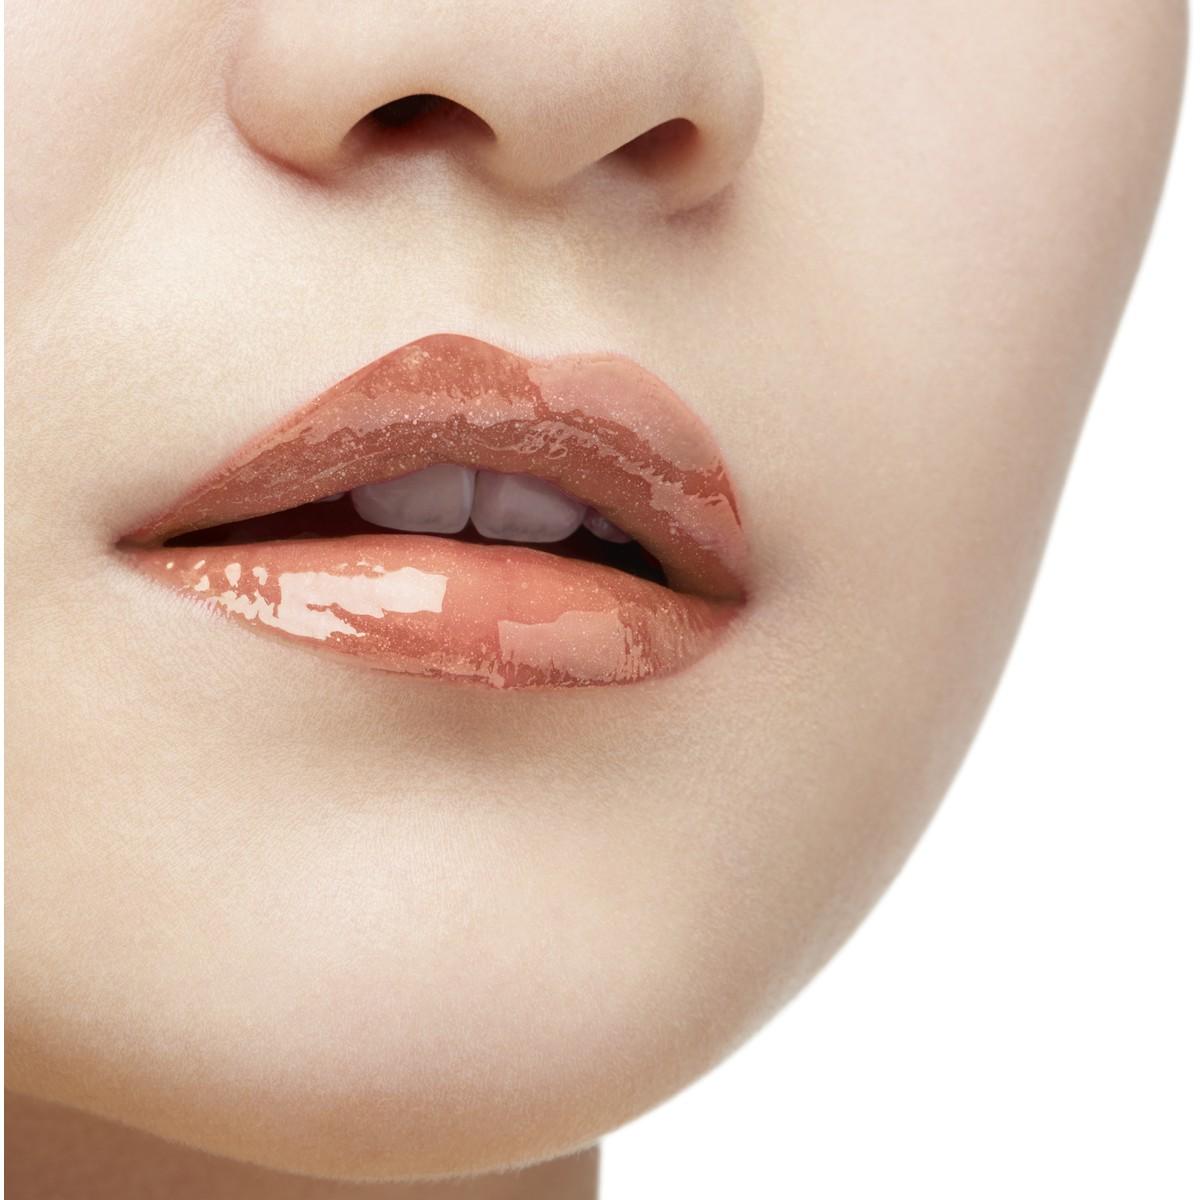 Beauty - Goldissima Loubilaque Lip Lacquer - Christian Louboutin